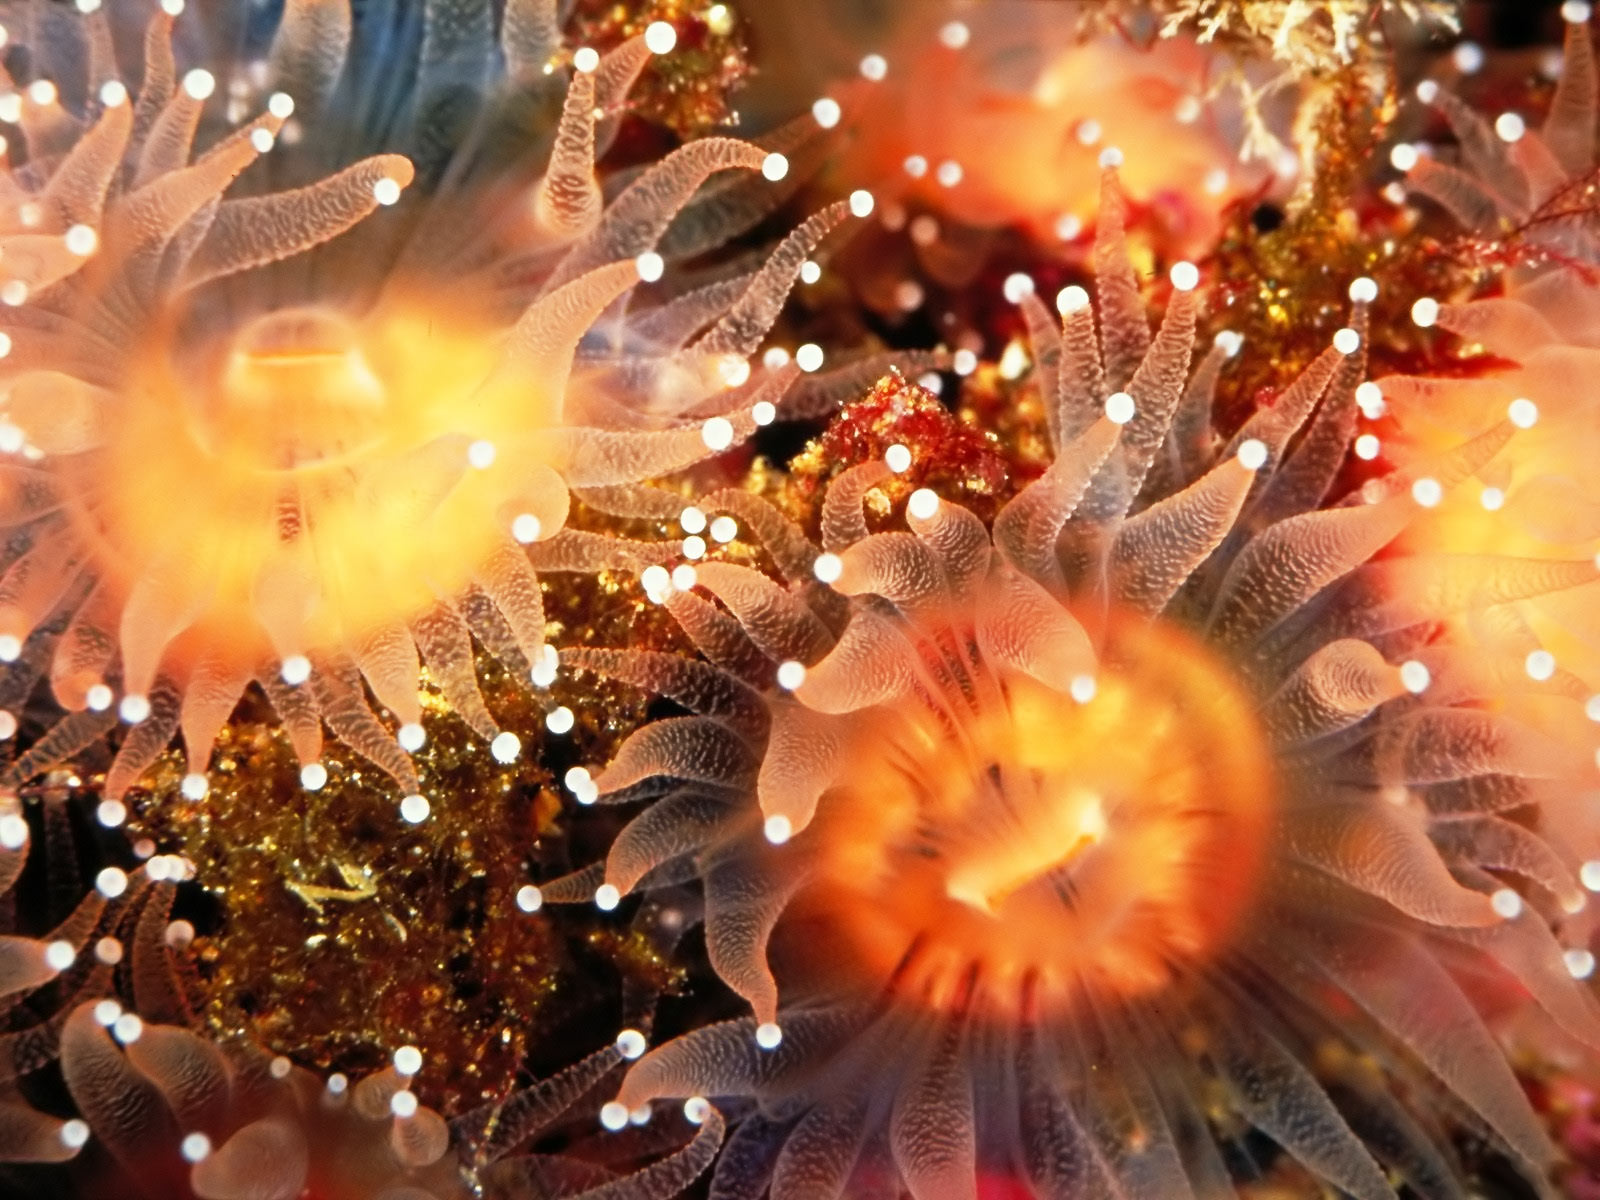 anemone computer wallpaper 26018